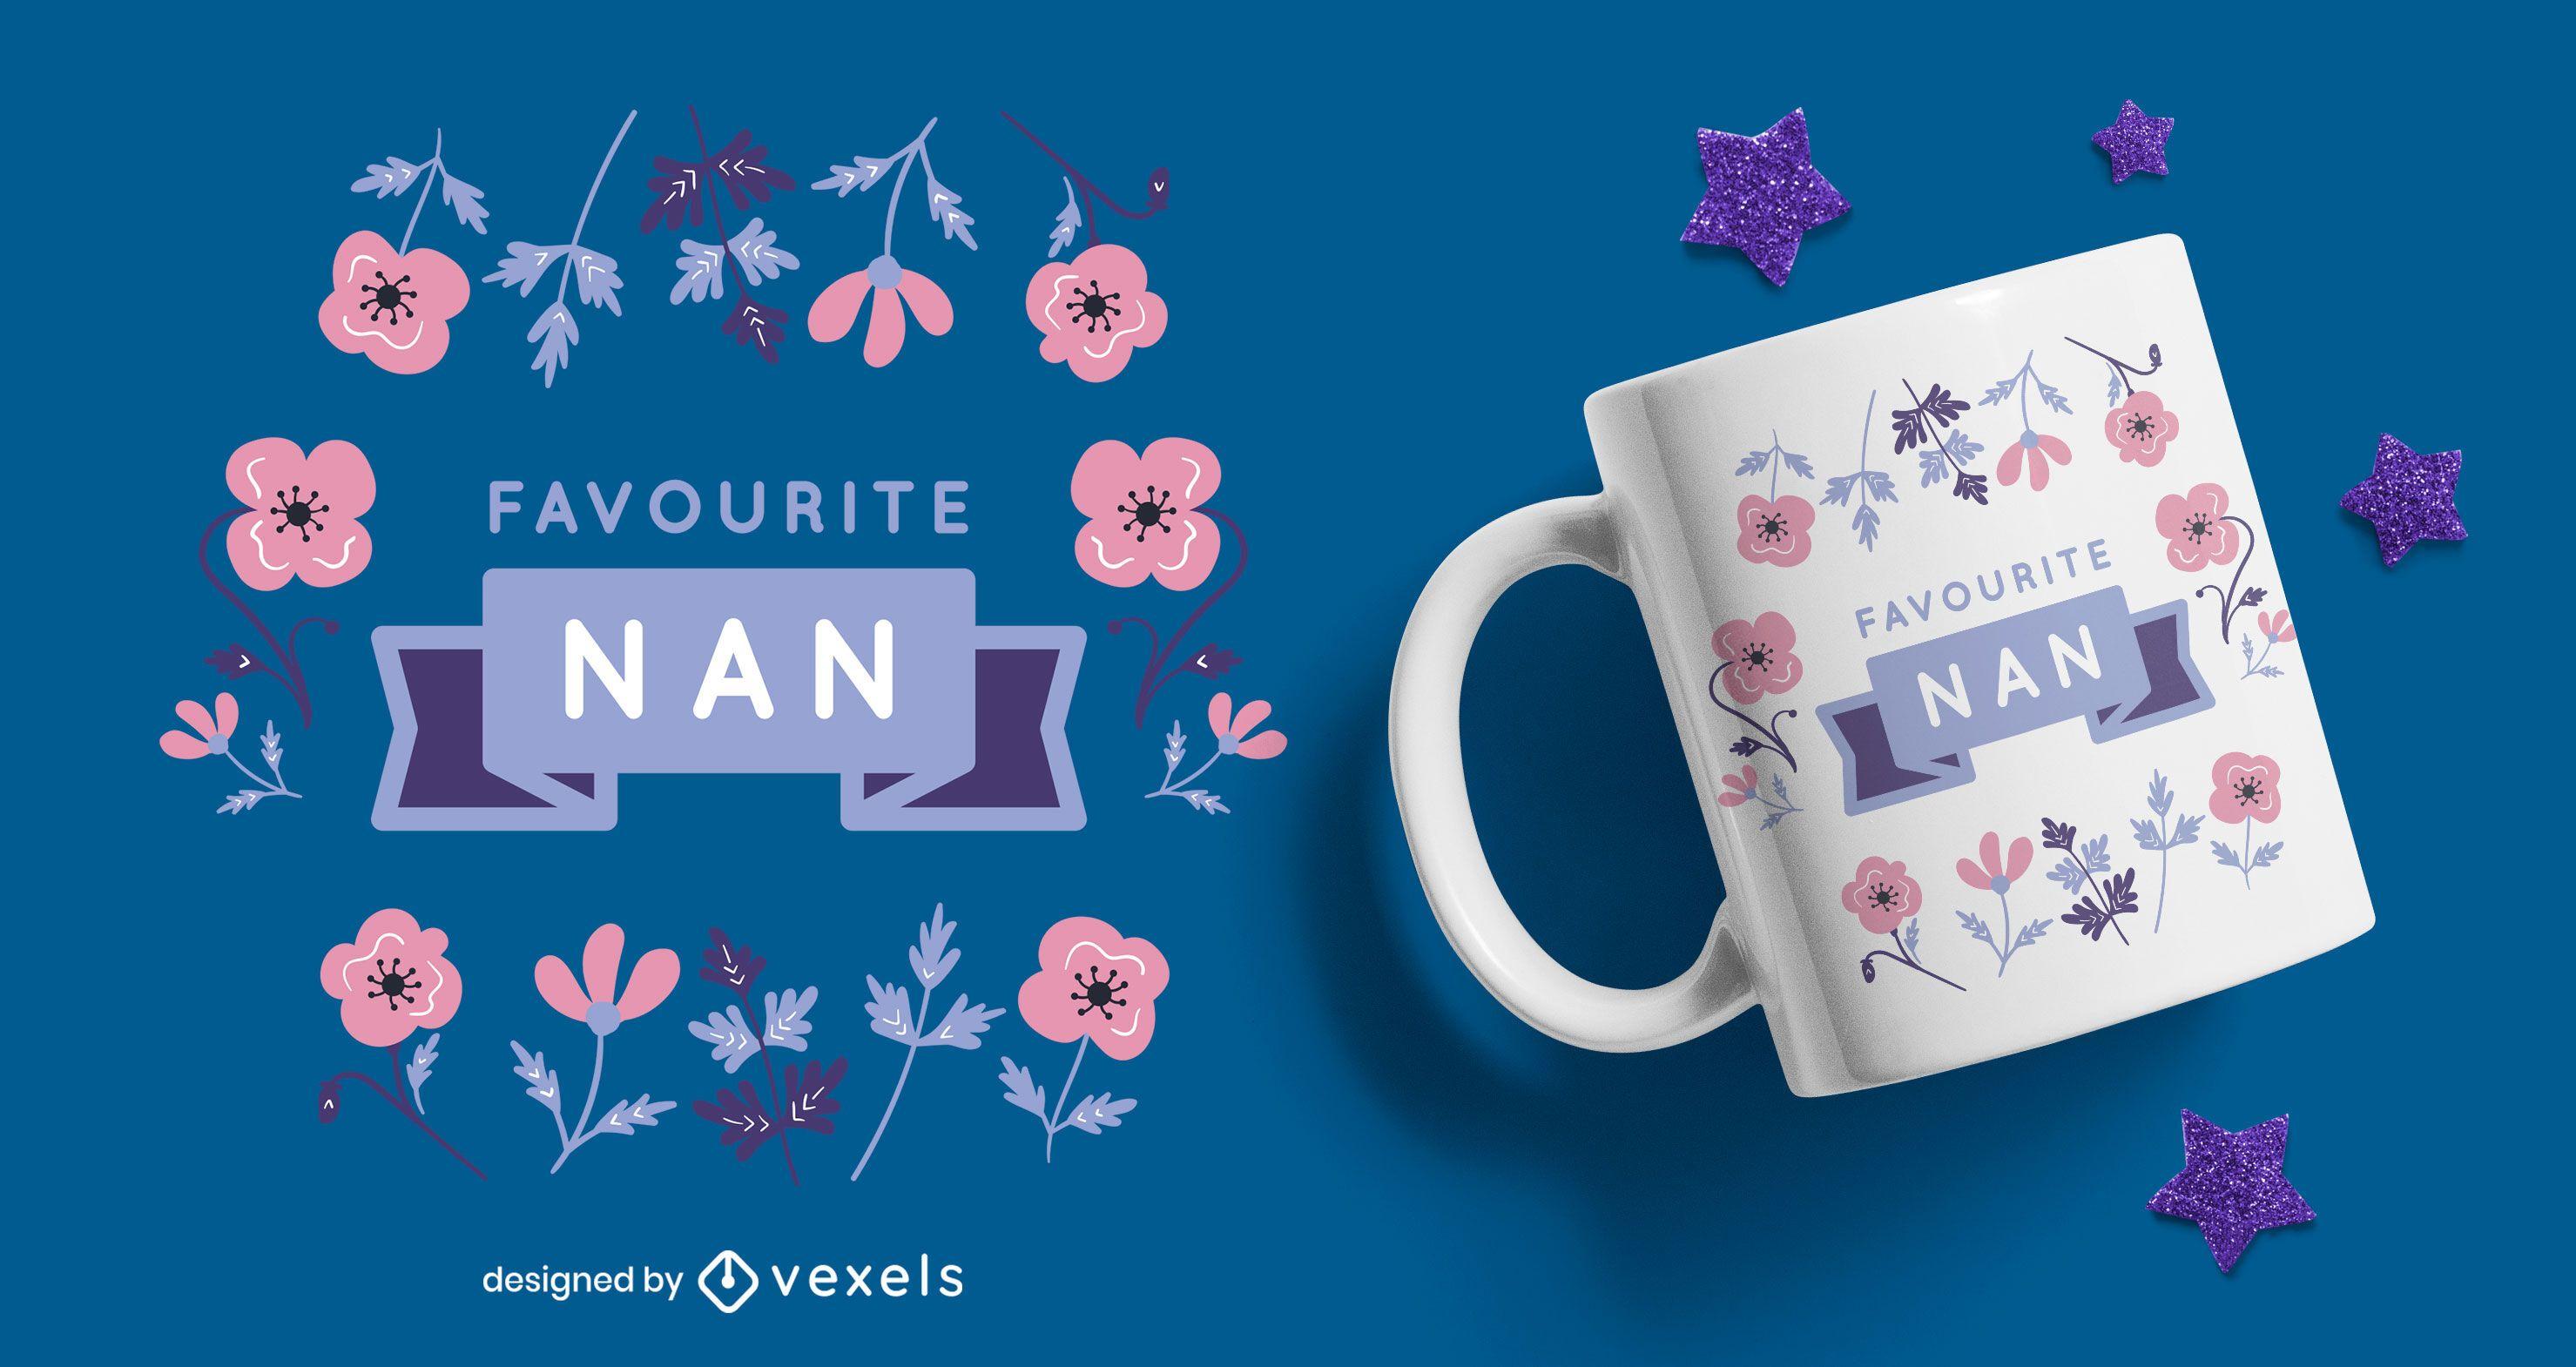 Favourite nan flowers flat mug design